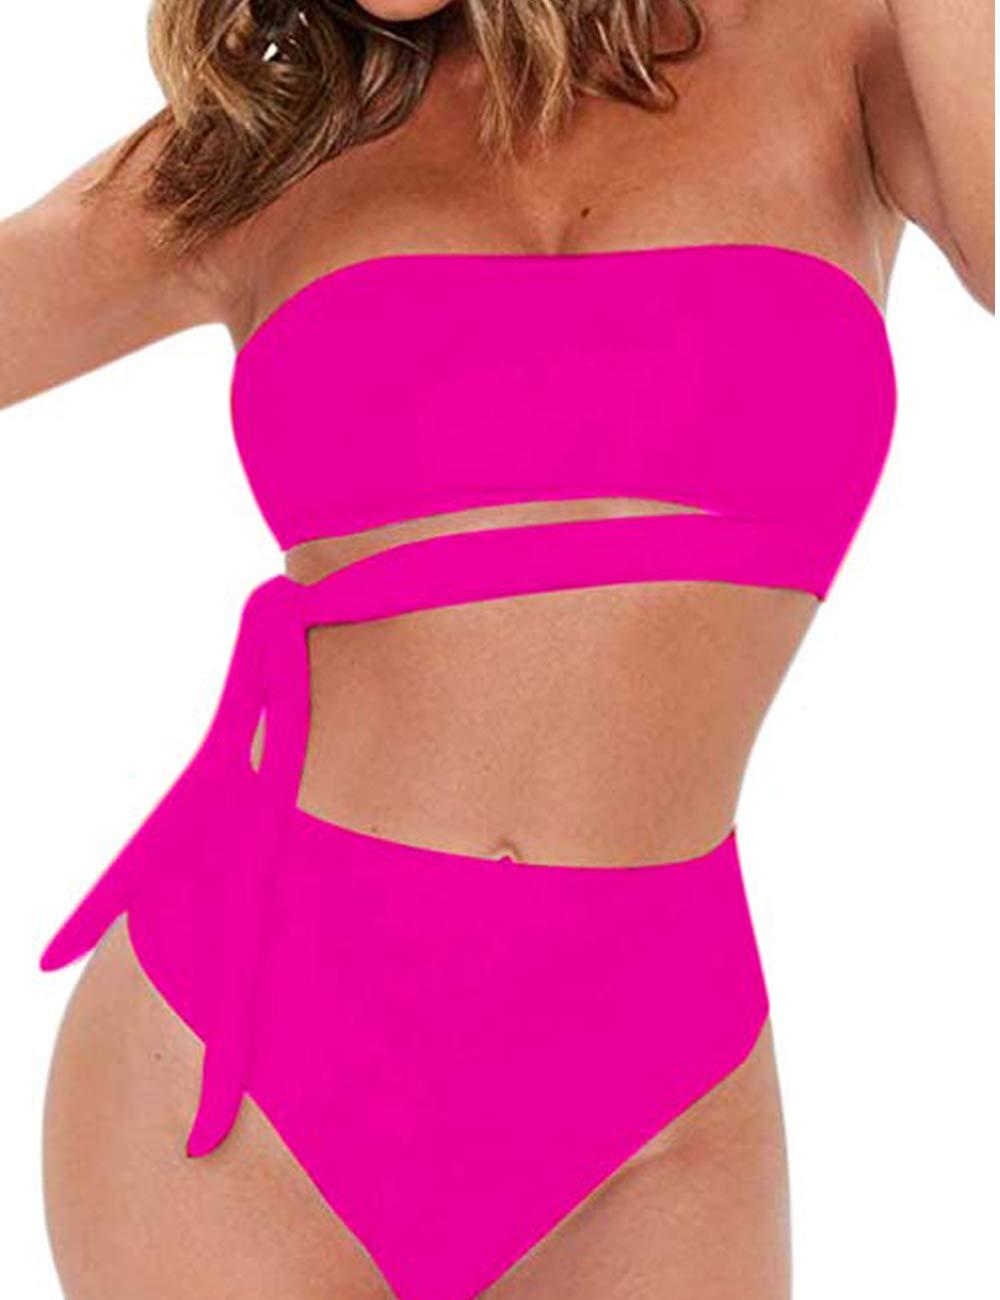 Jolefille High Waisted Two Piece Bikini Set Tie Waist Bathing Suit High Cut Bandeau Swimsuits for Women